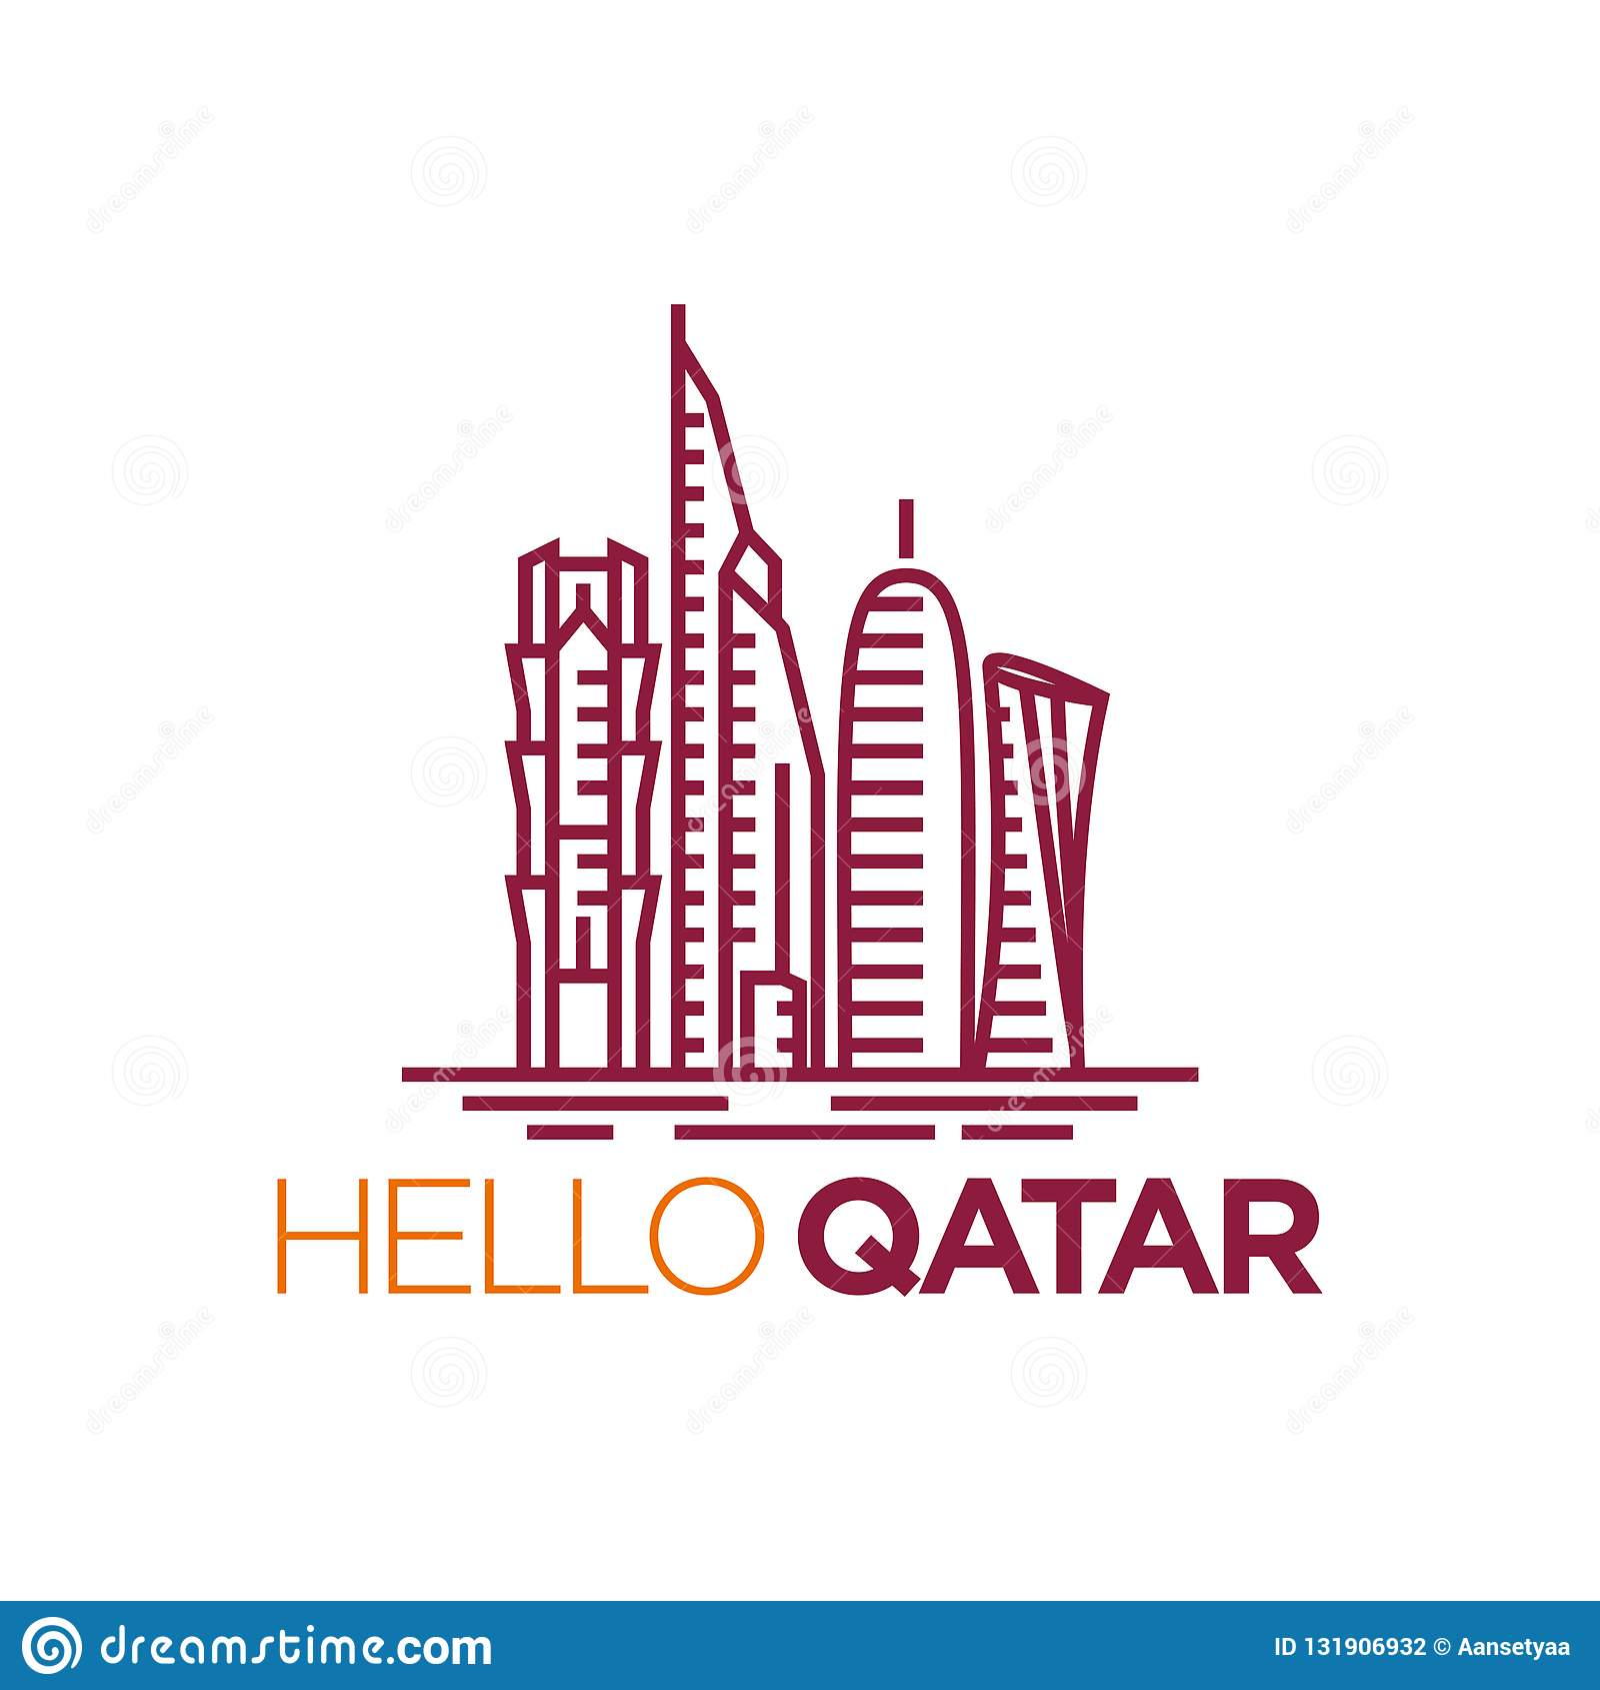 Qatar City Tower Logo Design Inspiration Qatar Tower Vector Stock Vector Illustration Of Vector Architecture 131906932